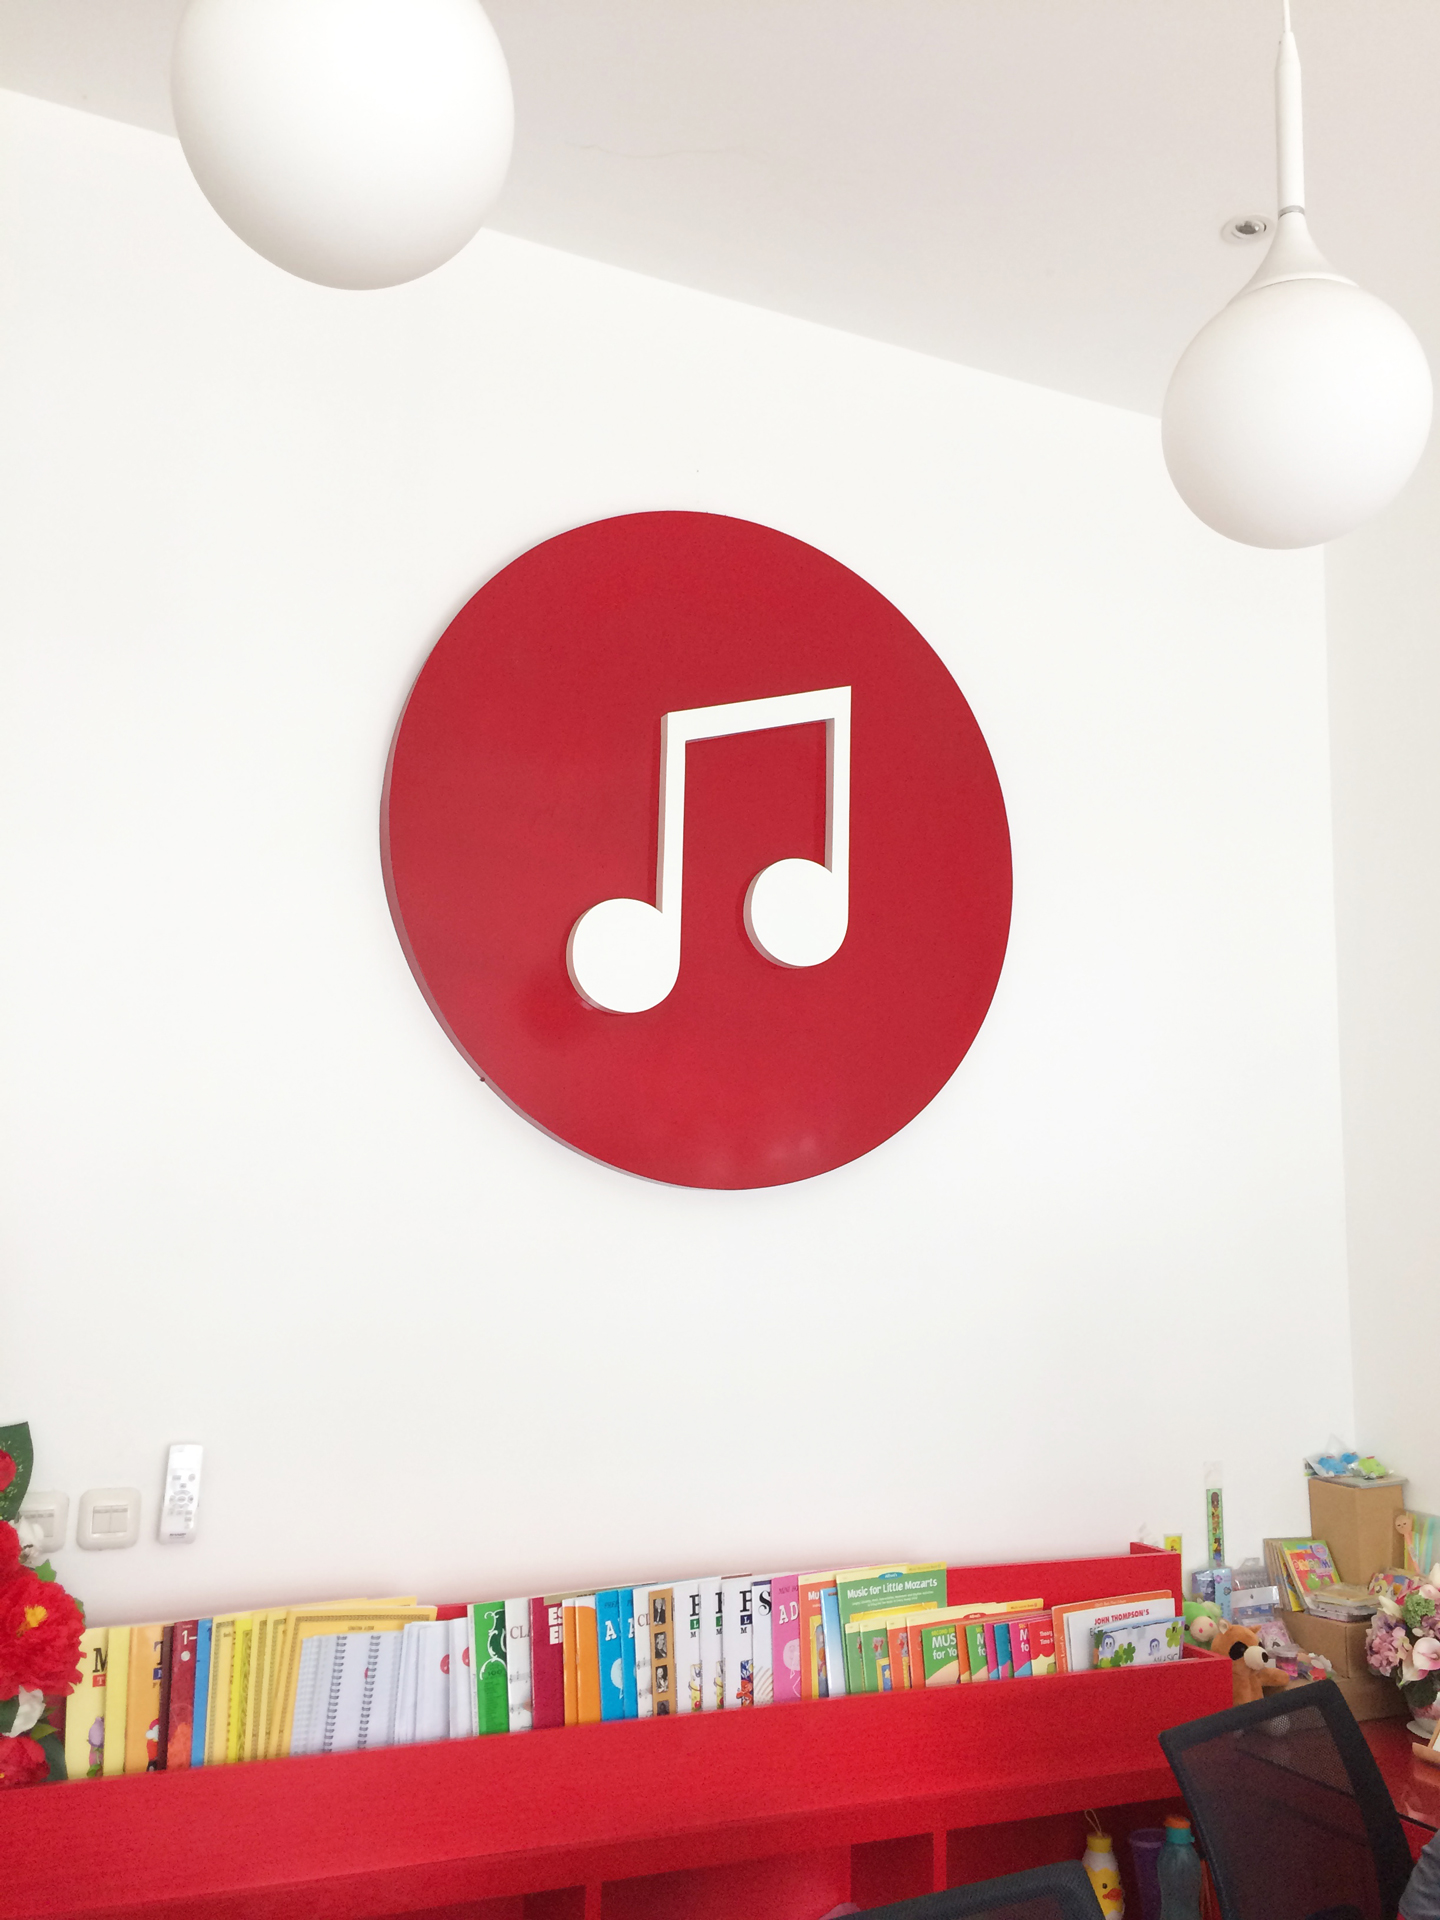 Octava Music School